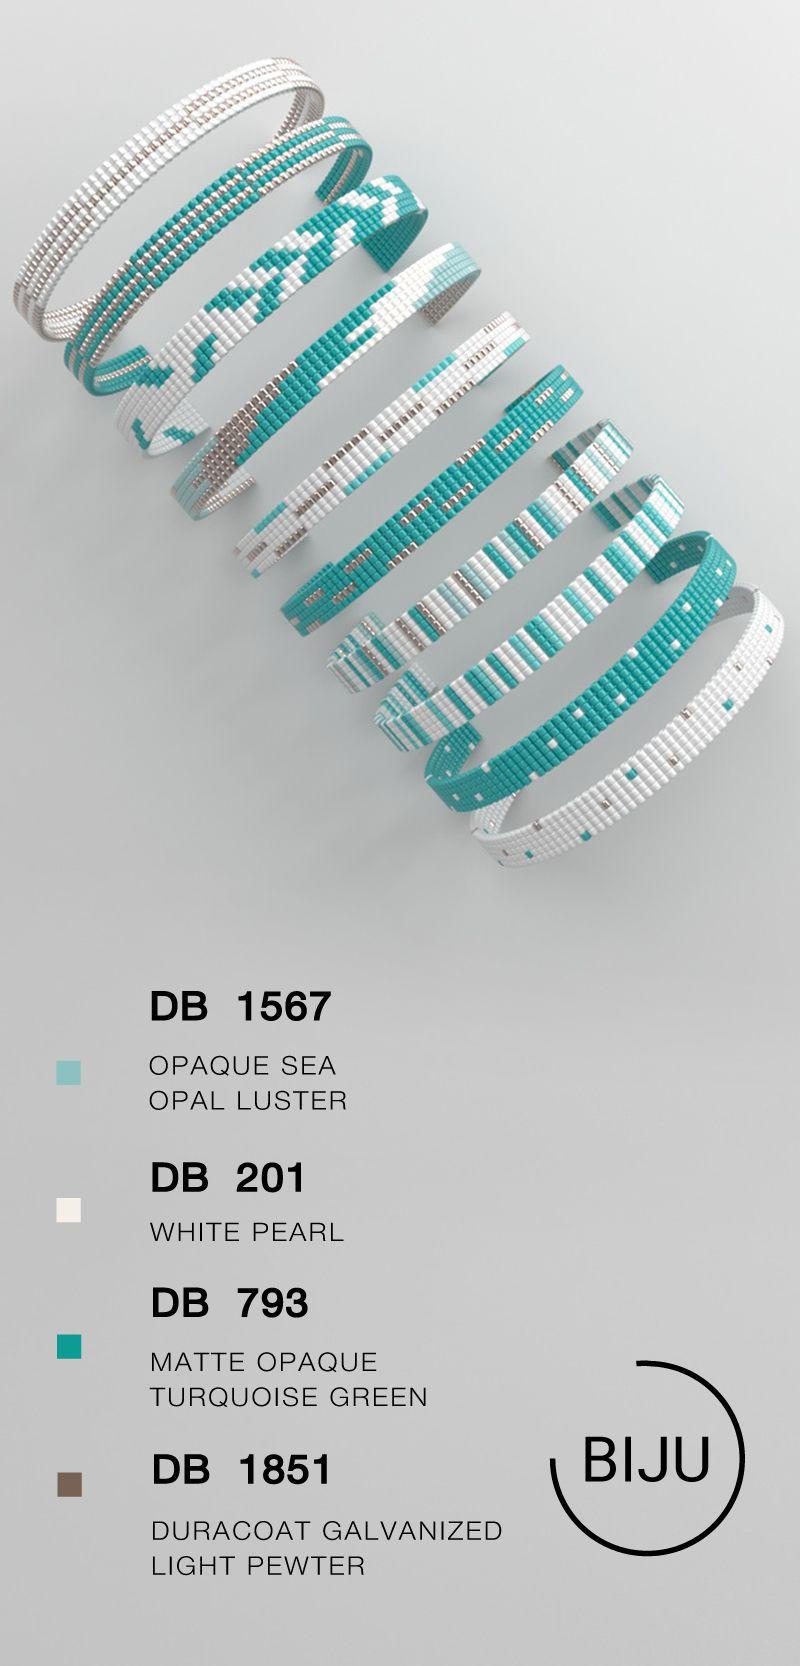 Loom bracelet pattern, loom pattern, miyuki pattern, square stitch pattern, pdf file, pdf pattern, cuff #70BIJU